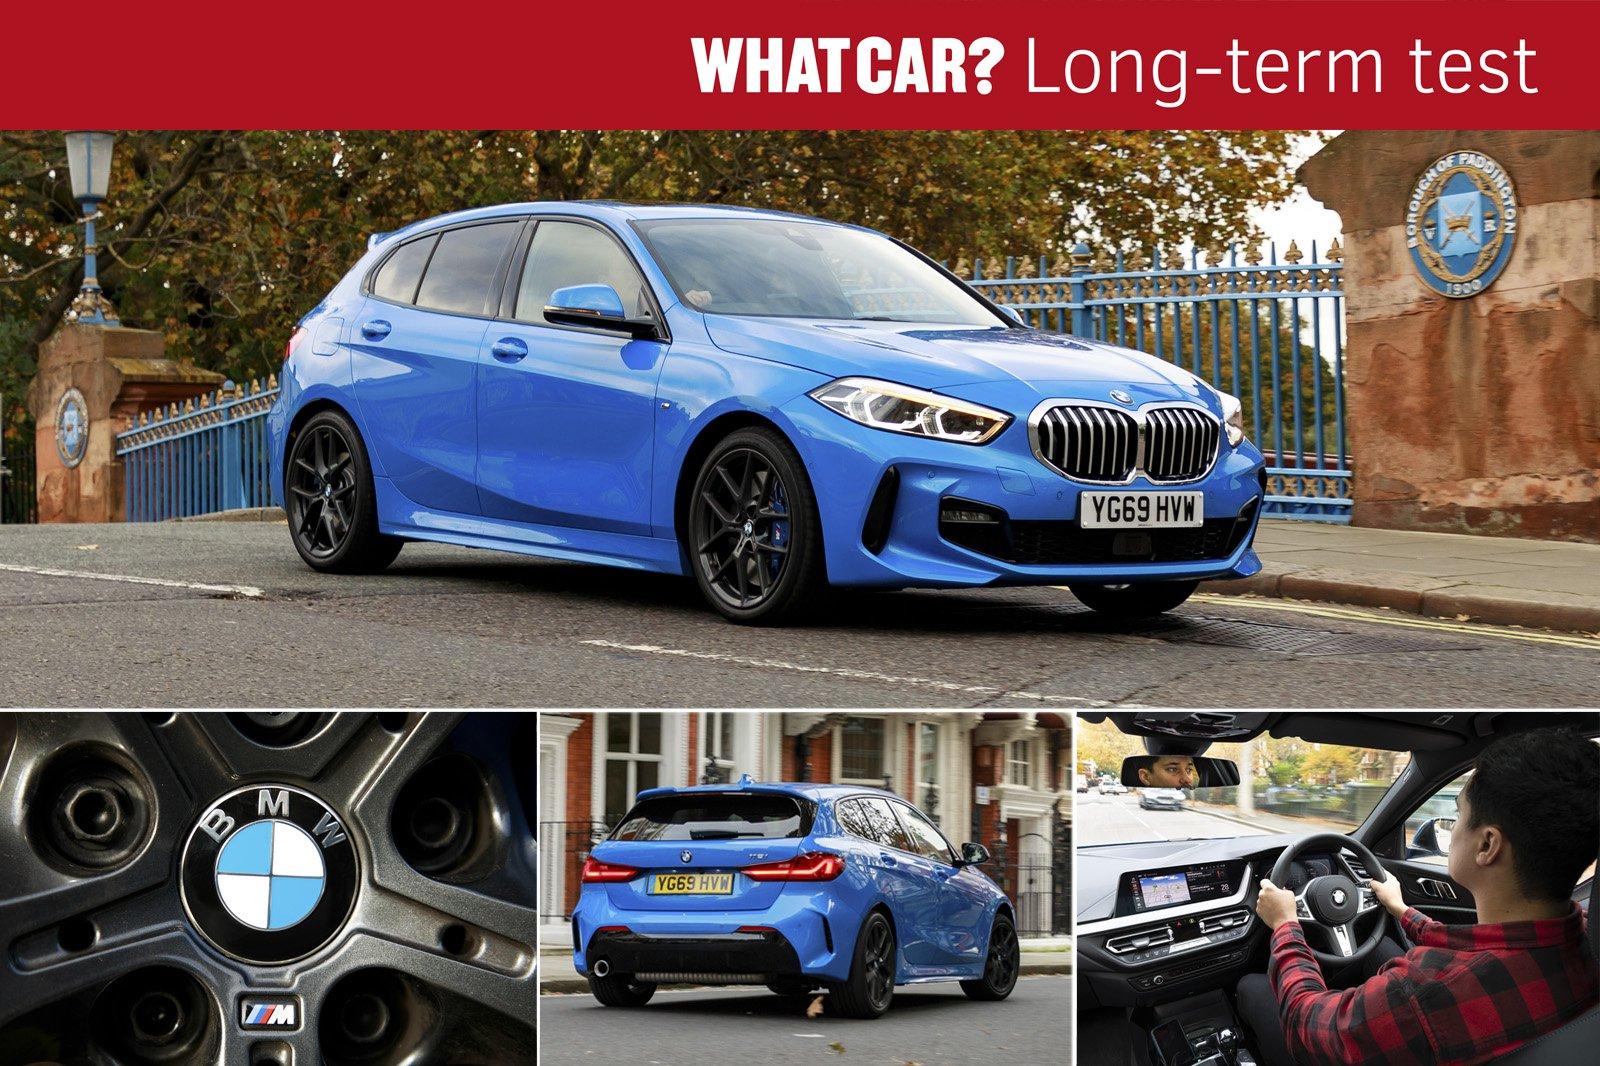 BMW 1 Series long-term test